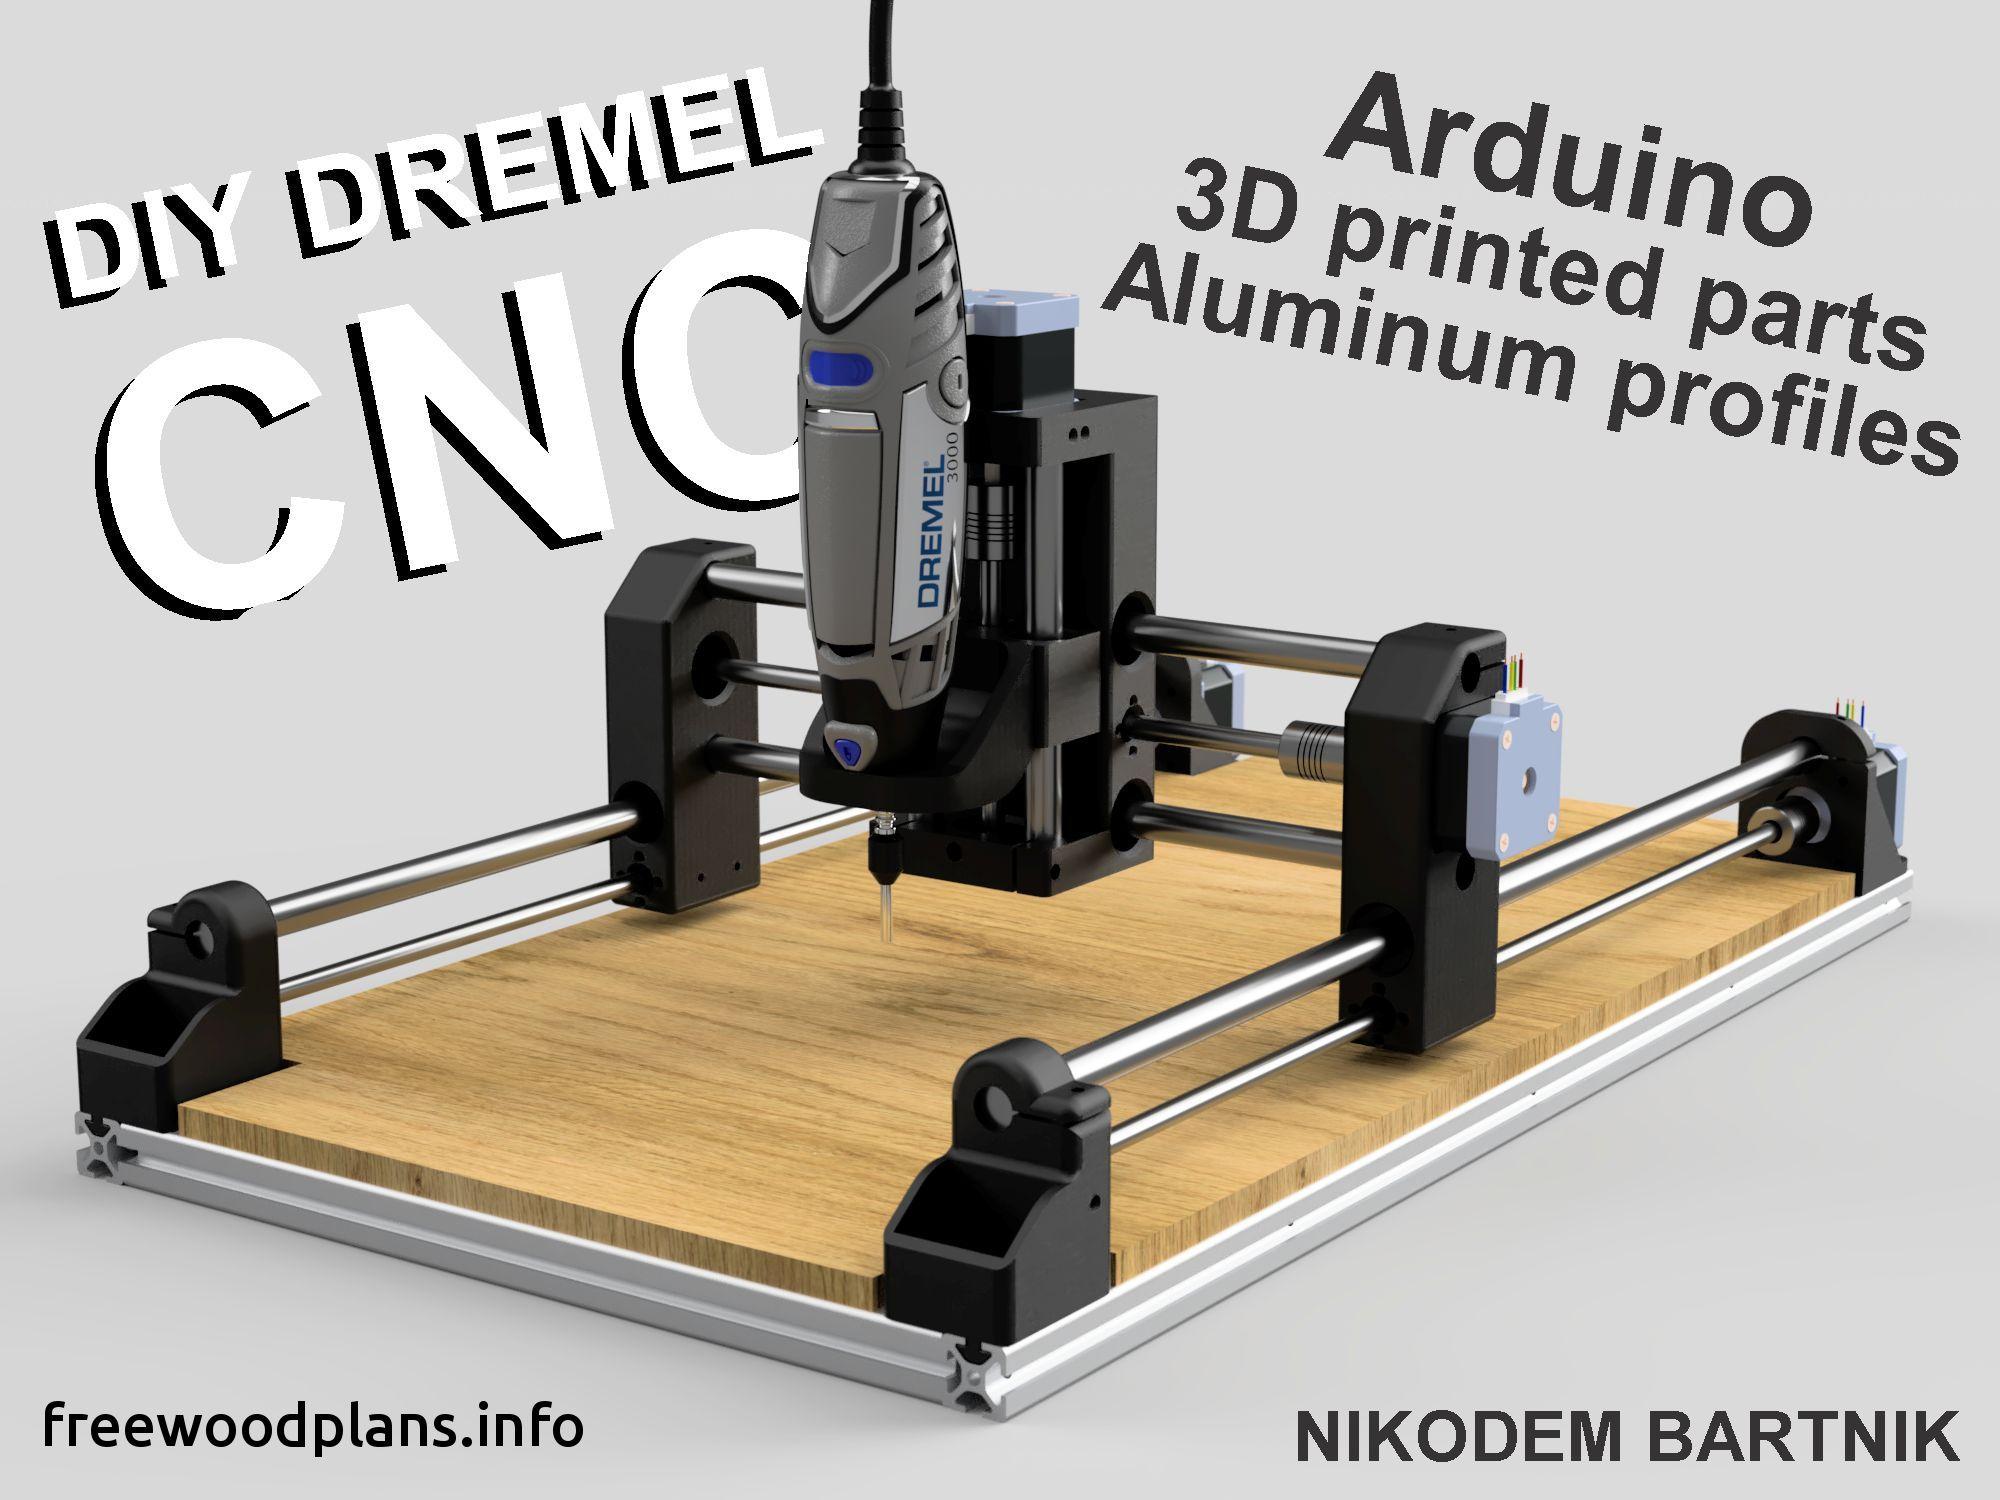 55 cnc for woodworking 2019 dremel cnc design